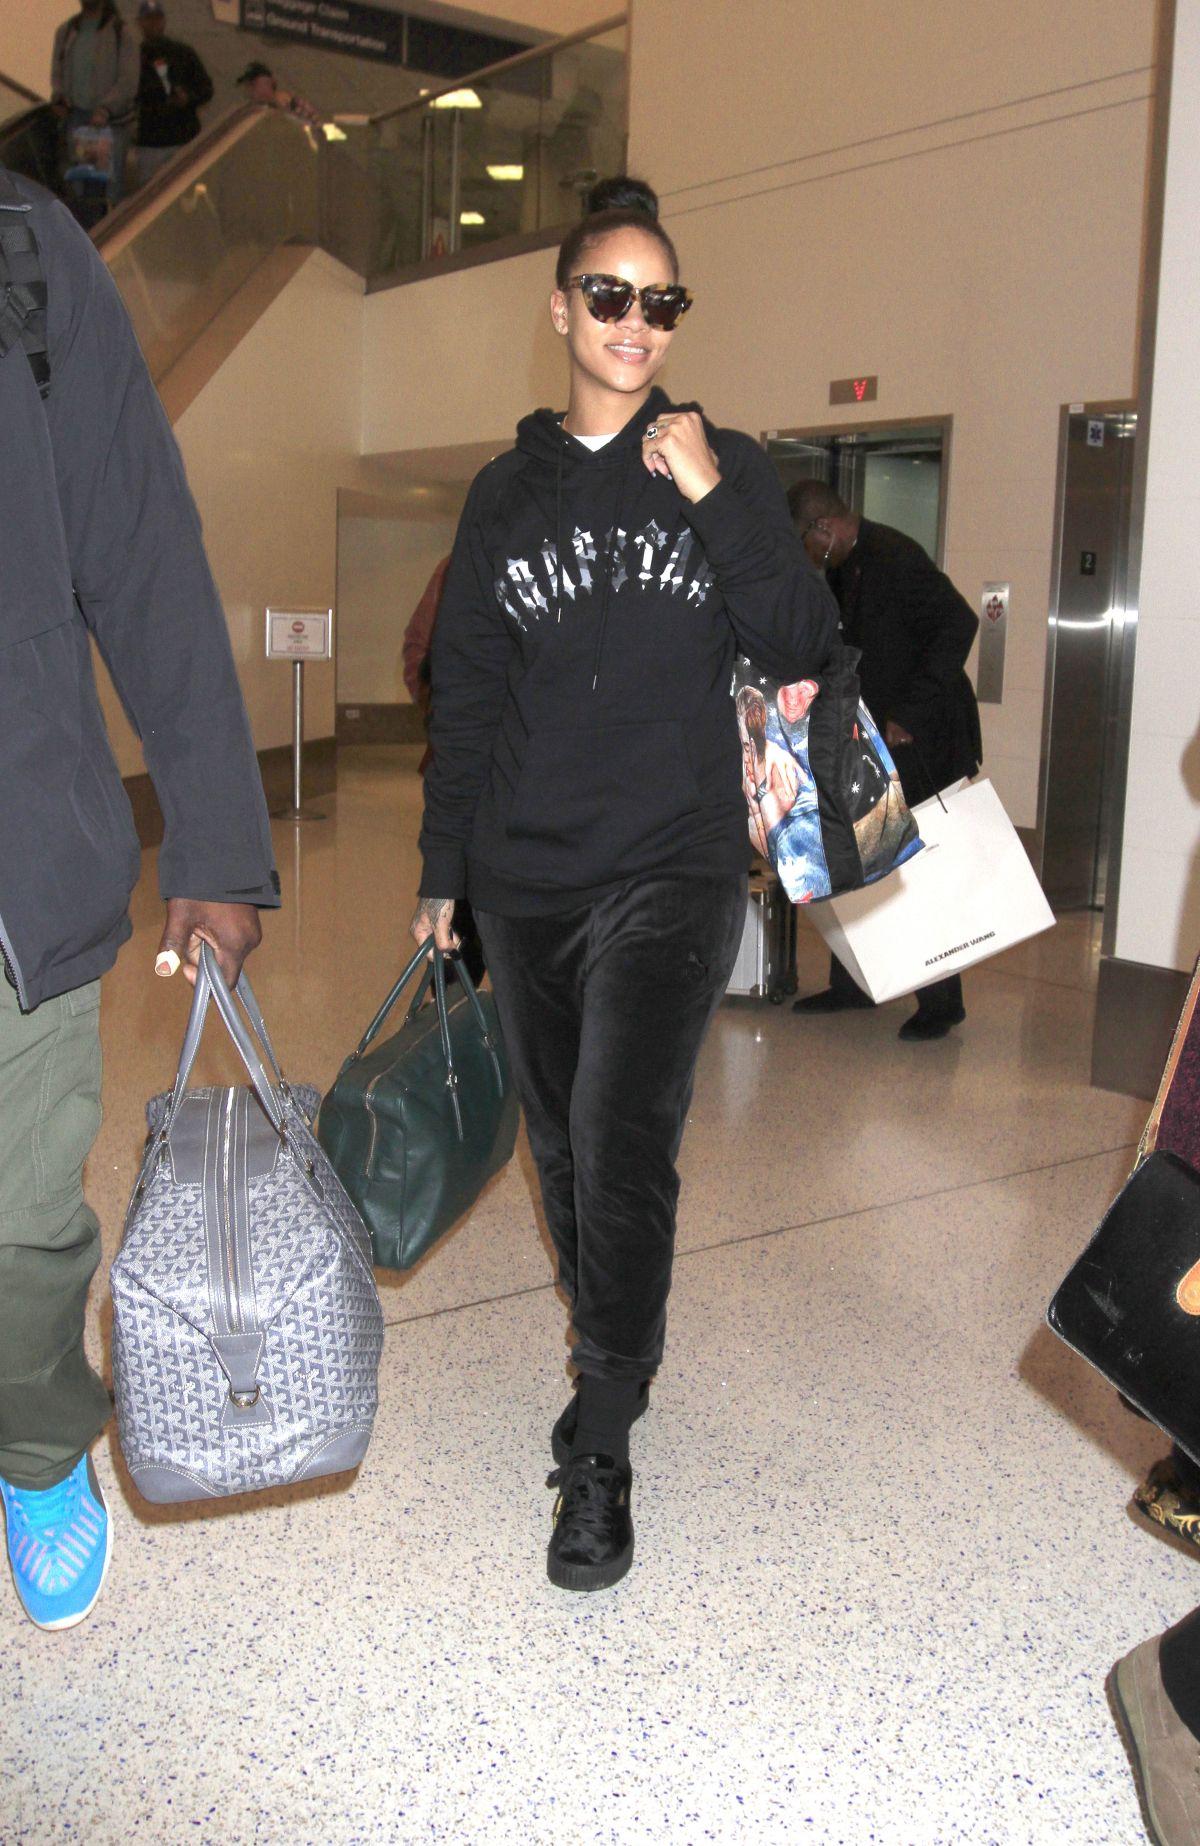 RIHANNA at LAX Airport in Los Angeles 02/08/2017